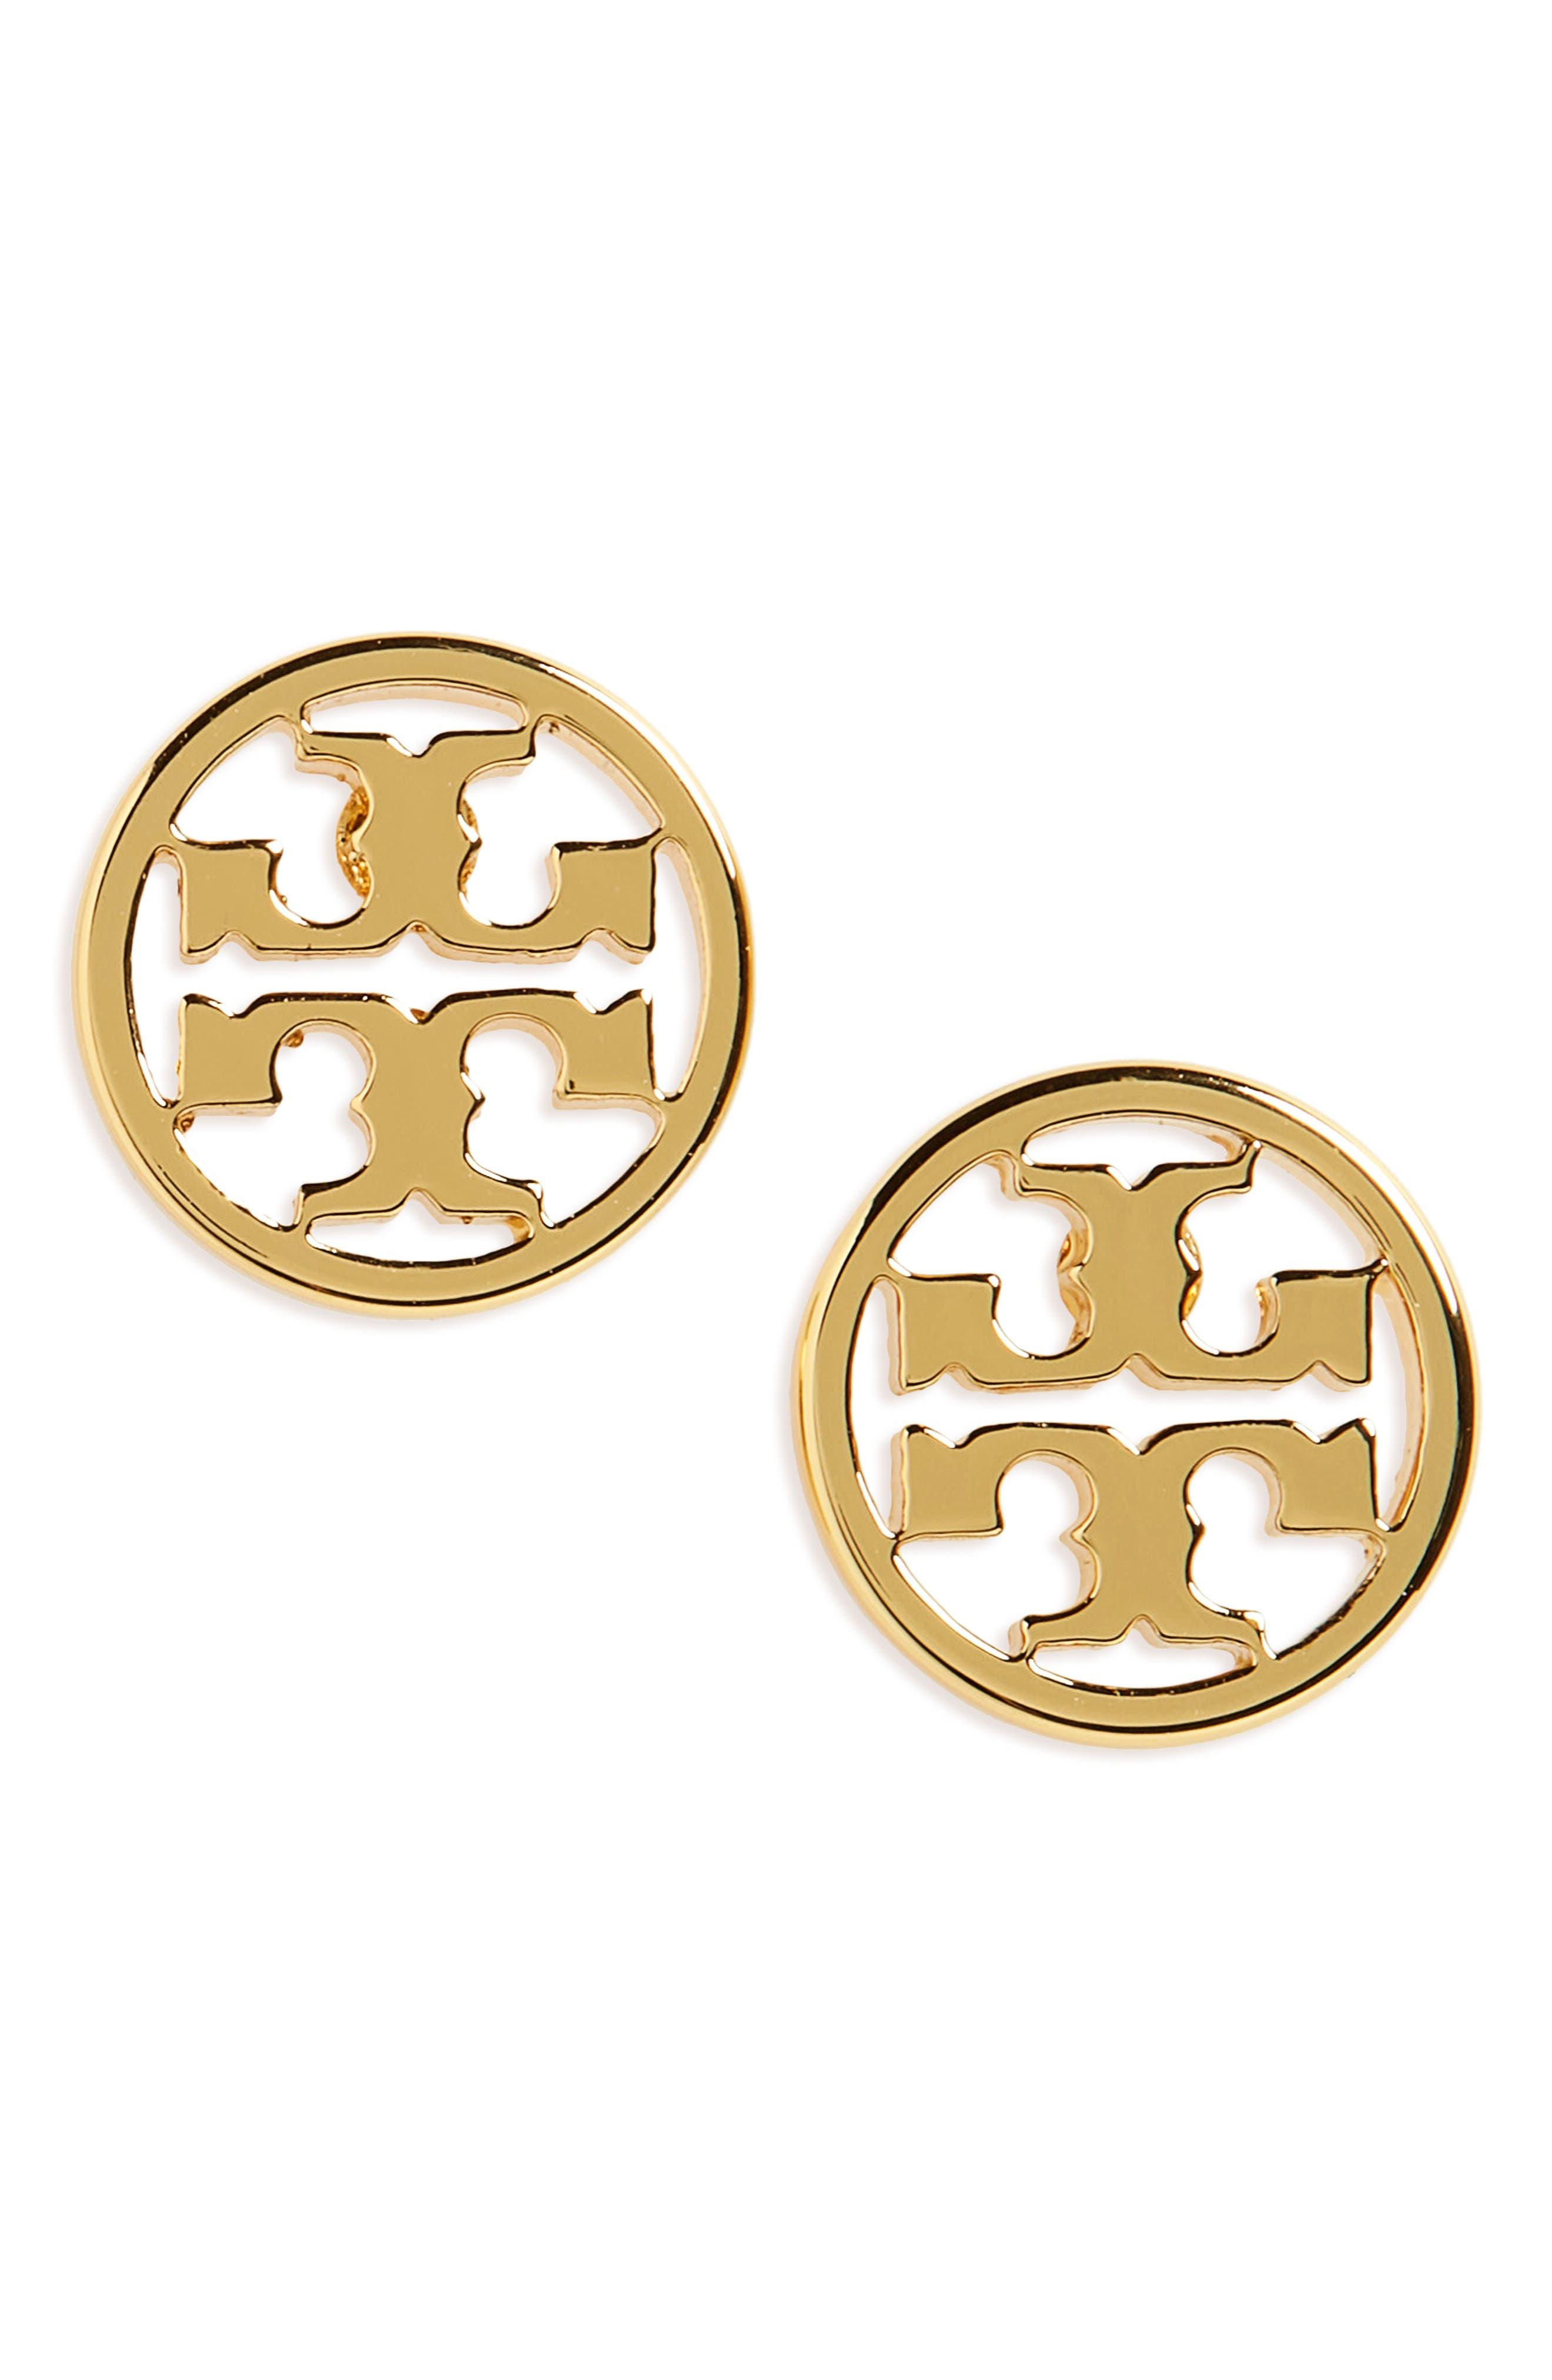 TORY BURCH Circle Logo Stud Earrings, Main, color, TORY GOLD